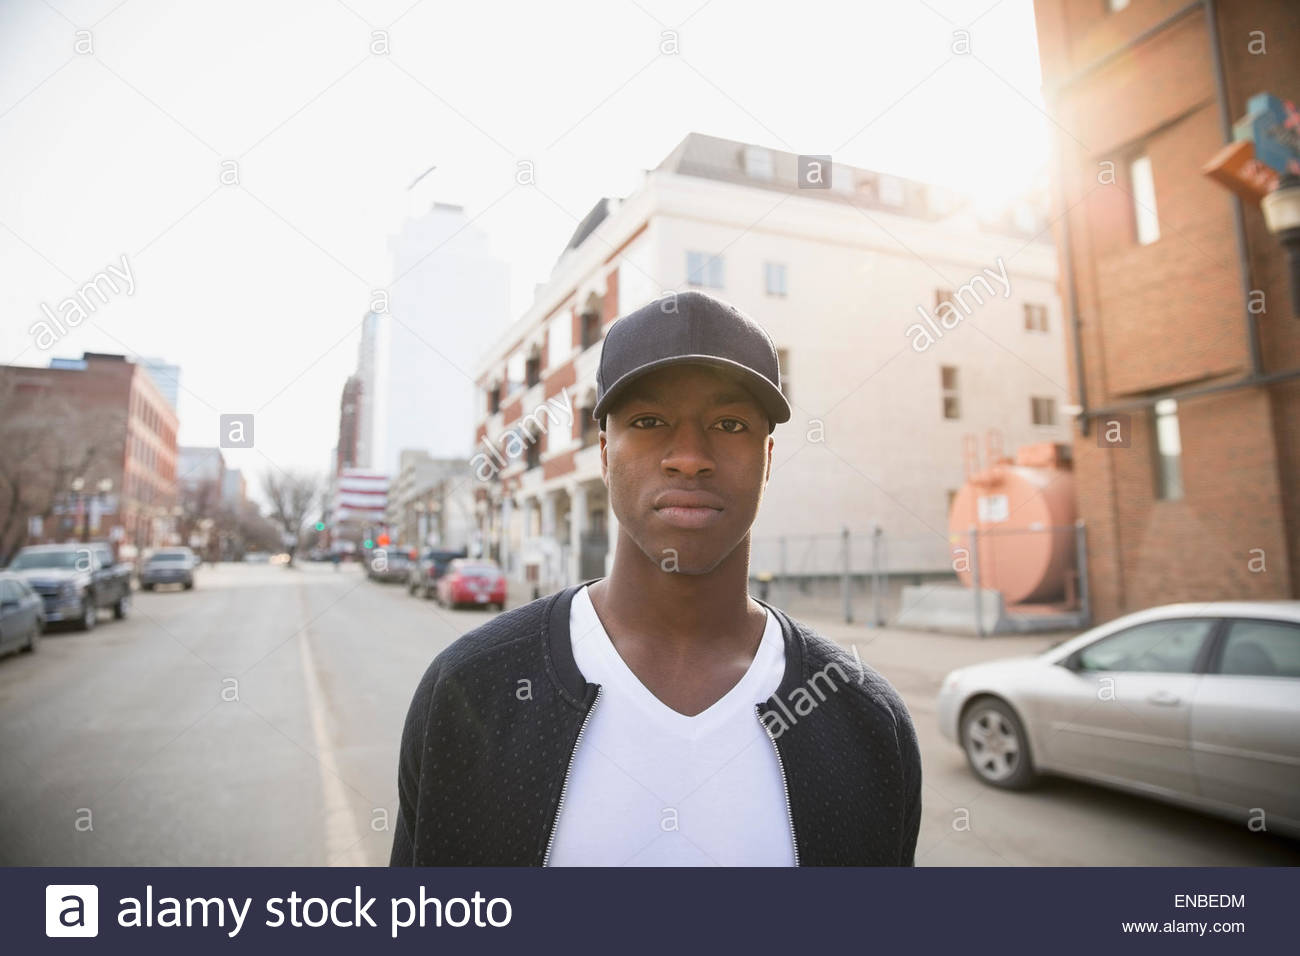 Portrait de l'homme graves baseball cap urban street Photo Stock